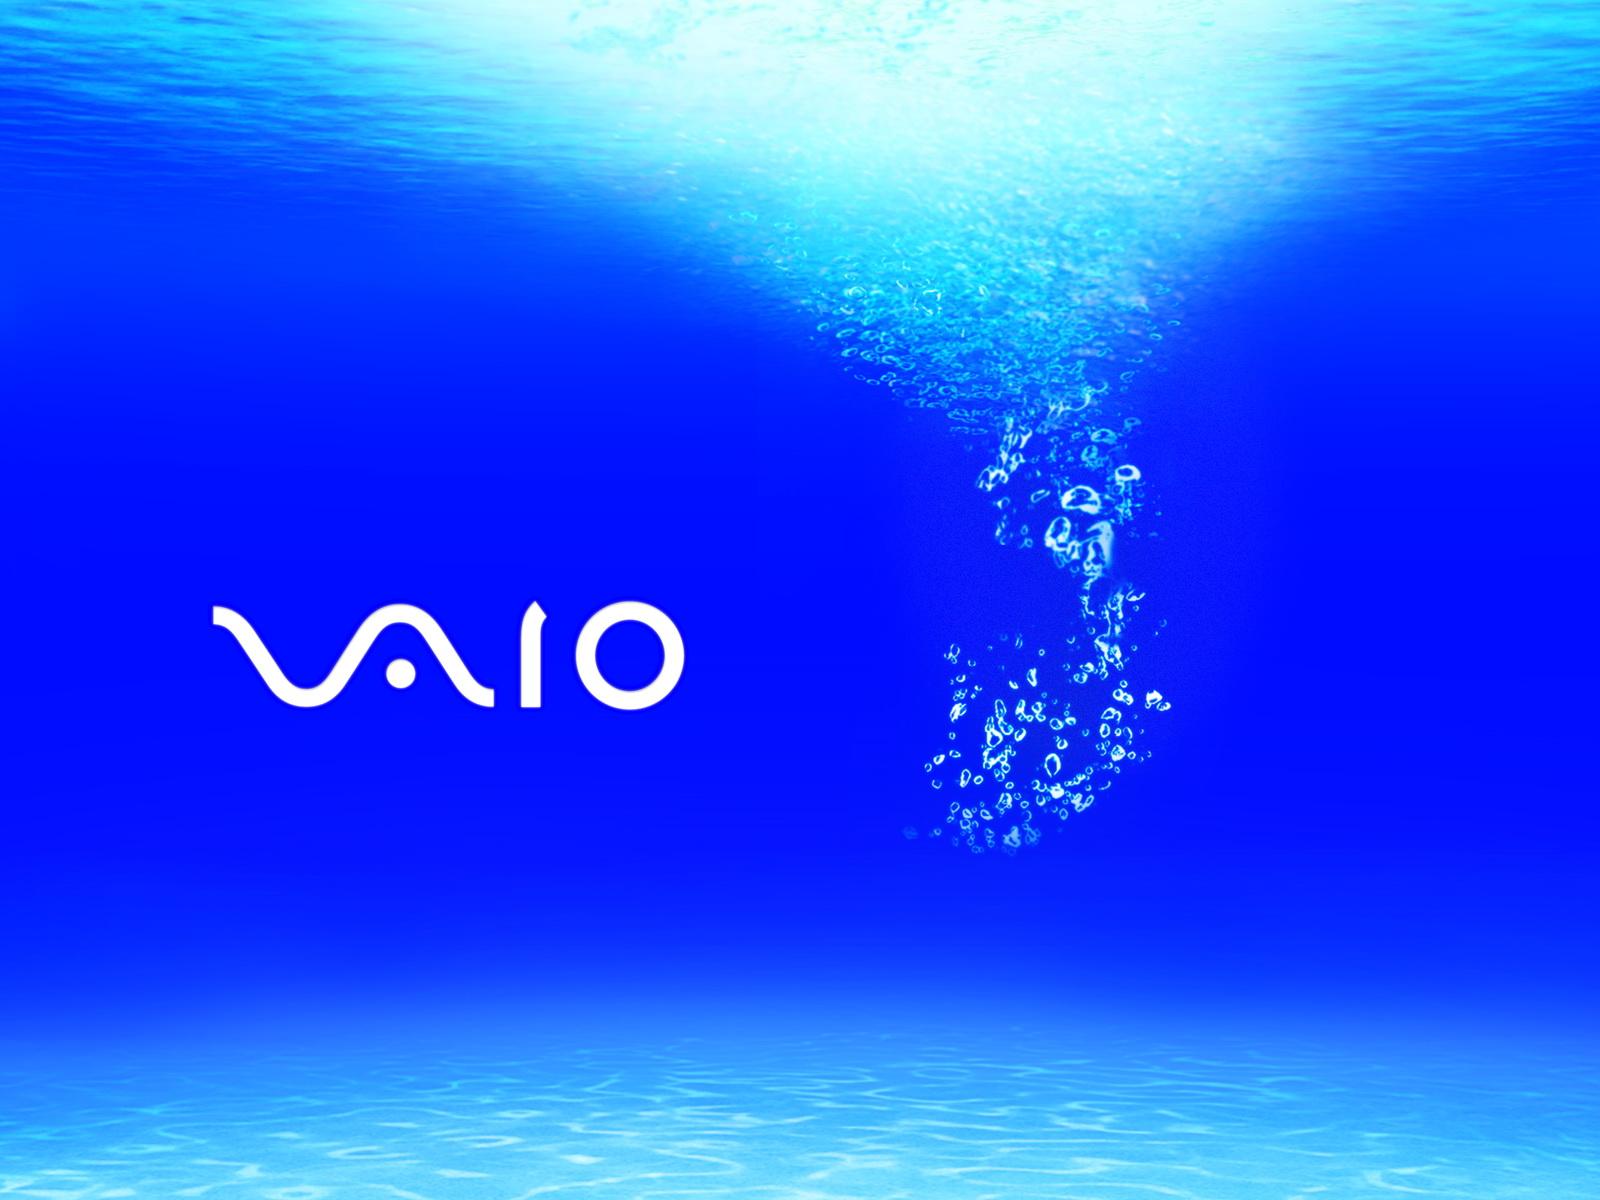 http://3.bp.blogspot.com/-A2w8O67sW9k/ThXQvuaoWcI/AAAAAAAAAAo/WTAQ5al5rFw/s1600/vaio+wallpaper+%25284%2529.jpg